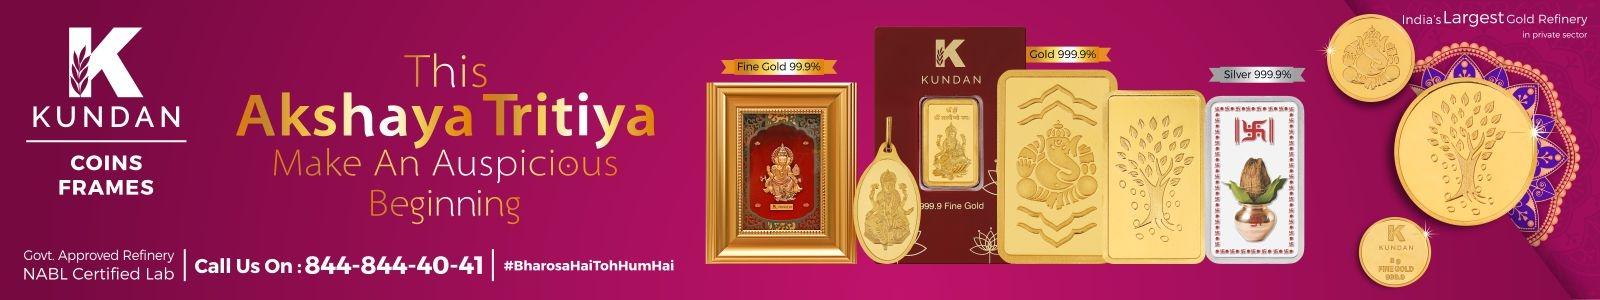 Why Buying Gold Brings Good Luck on Akshaya Tritiya?